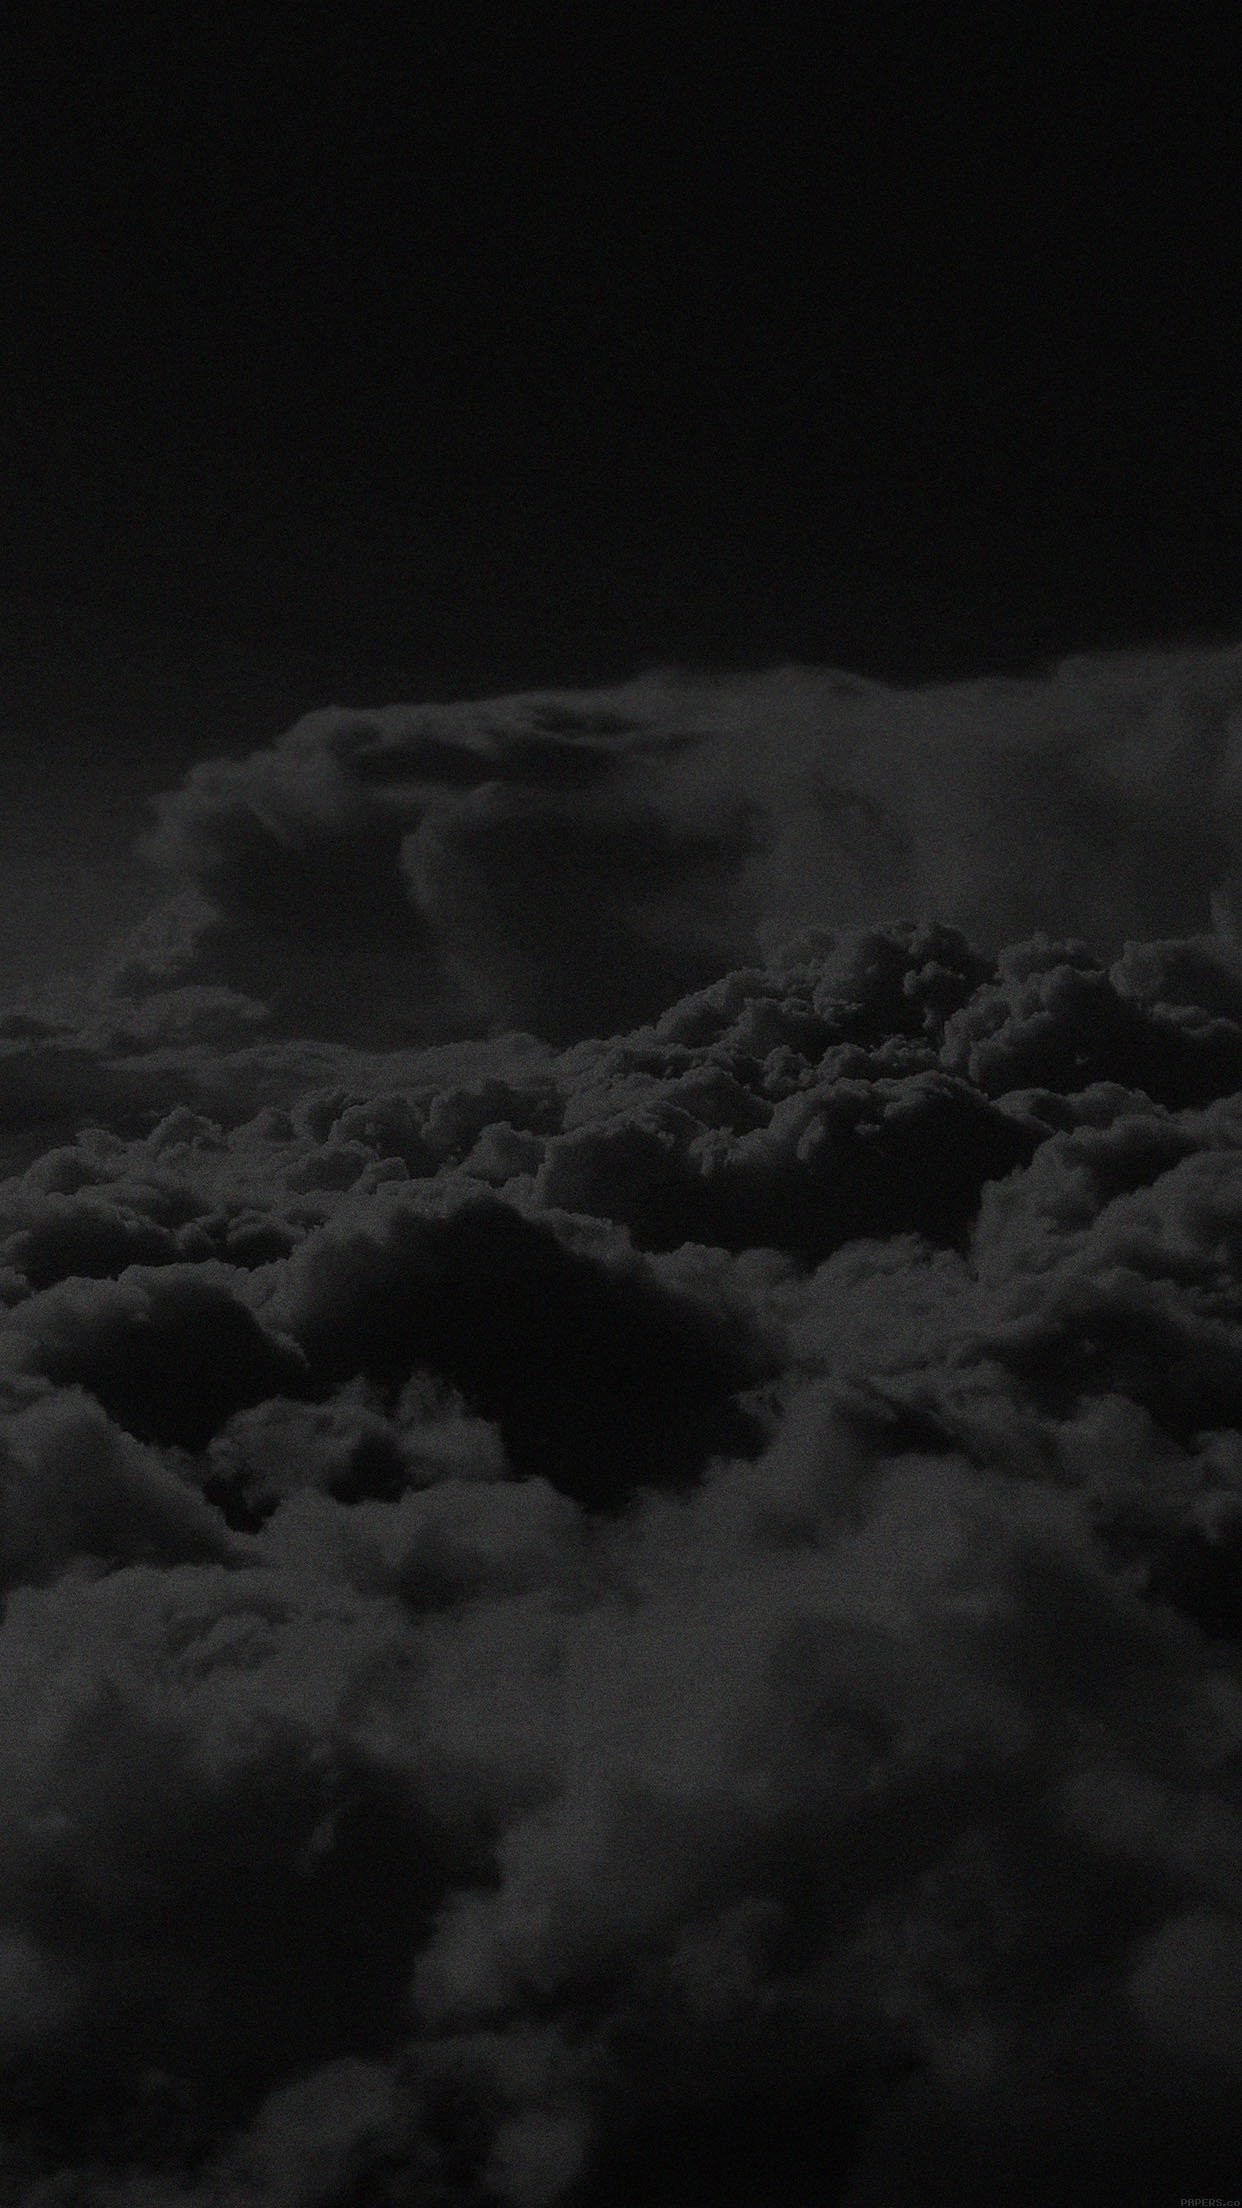 Cool Wallpapers Hd Iphone 7 Dark Cloud Wallpaper 64 Images